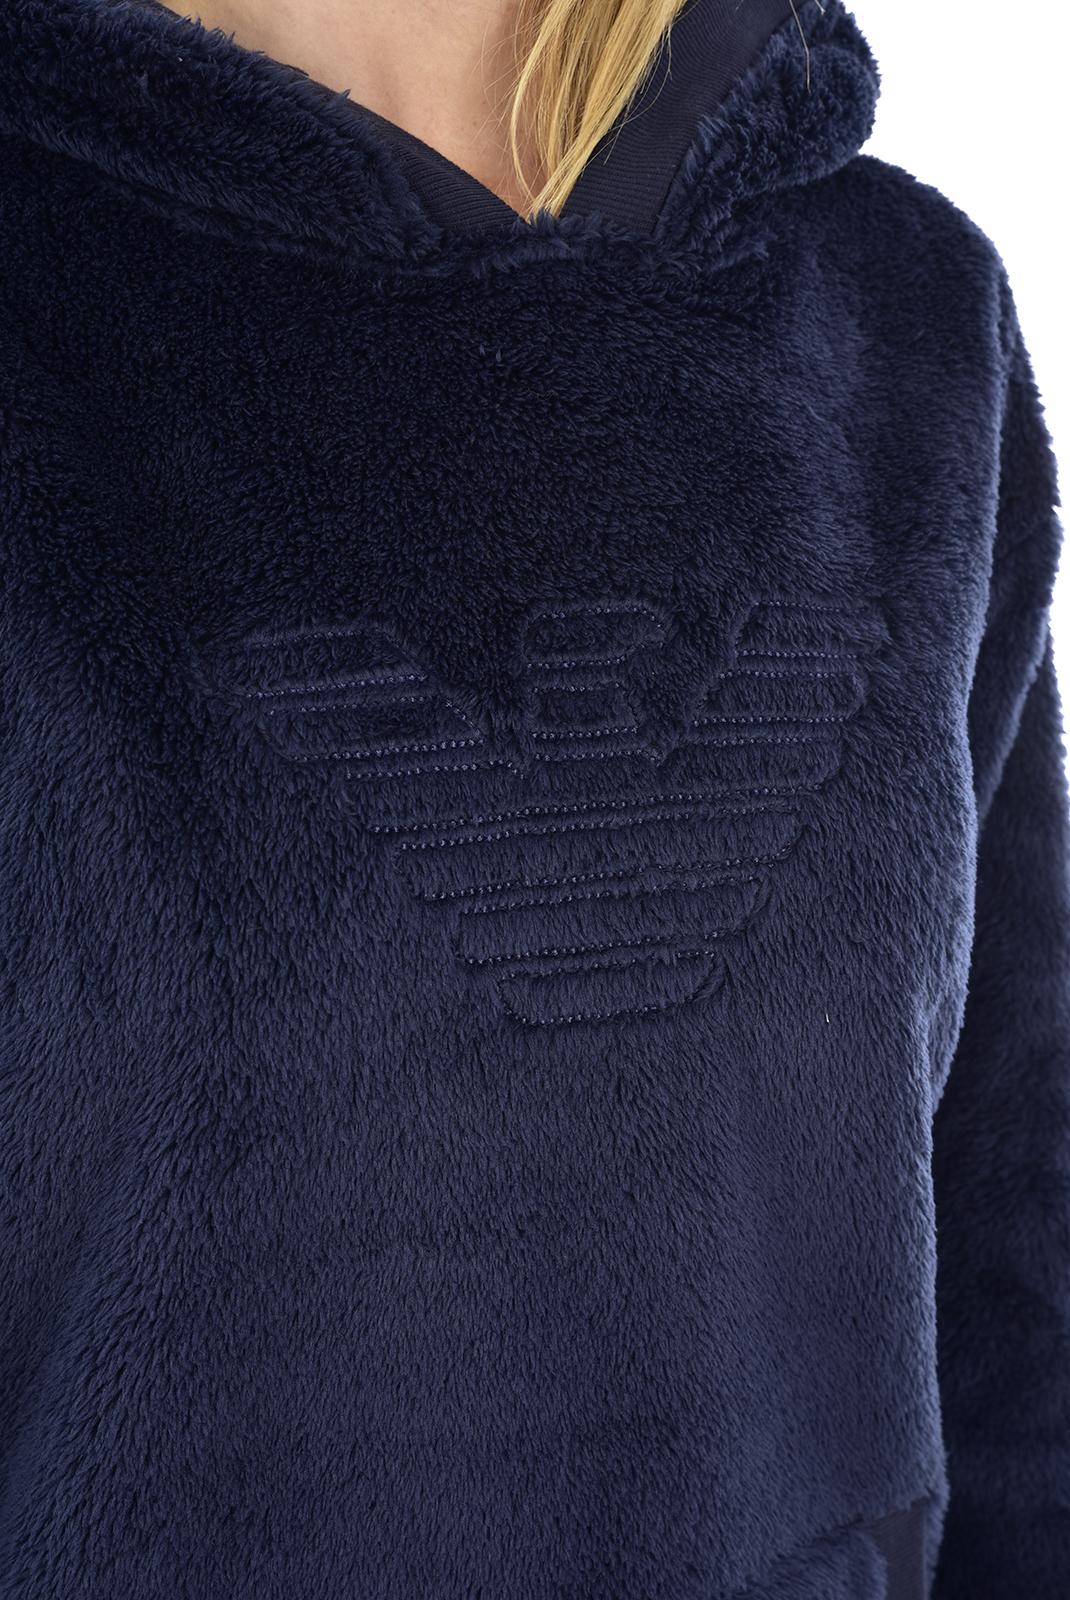 Sweat / sweat zippé  Emporio armani 164218 9A258 00135 BLEU